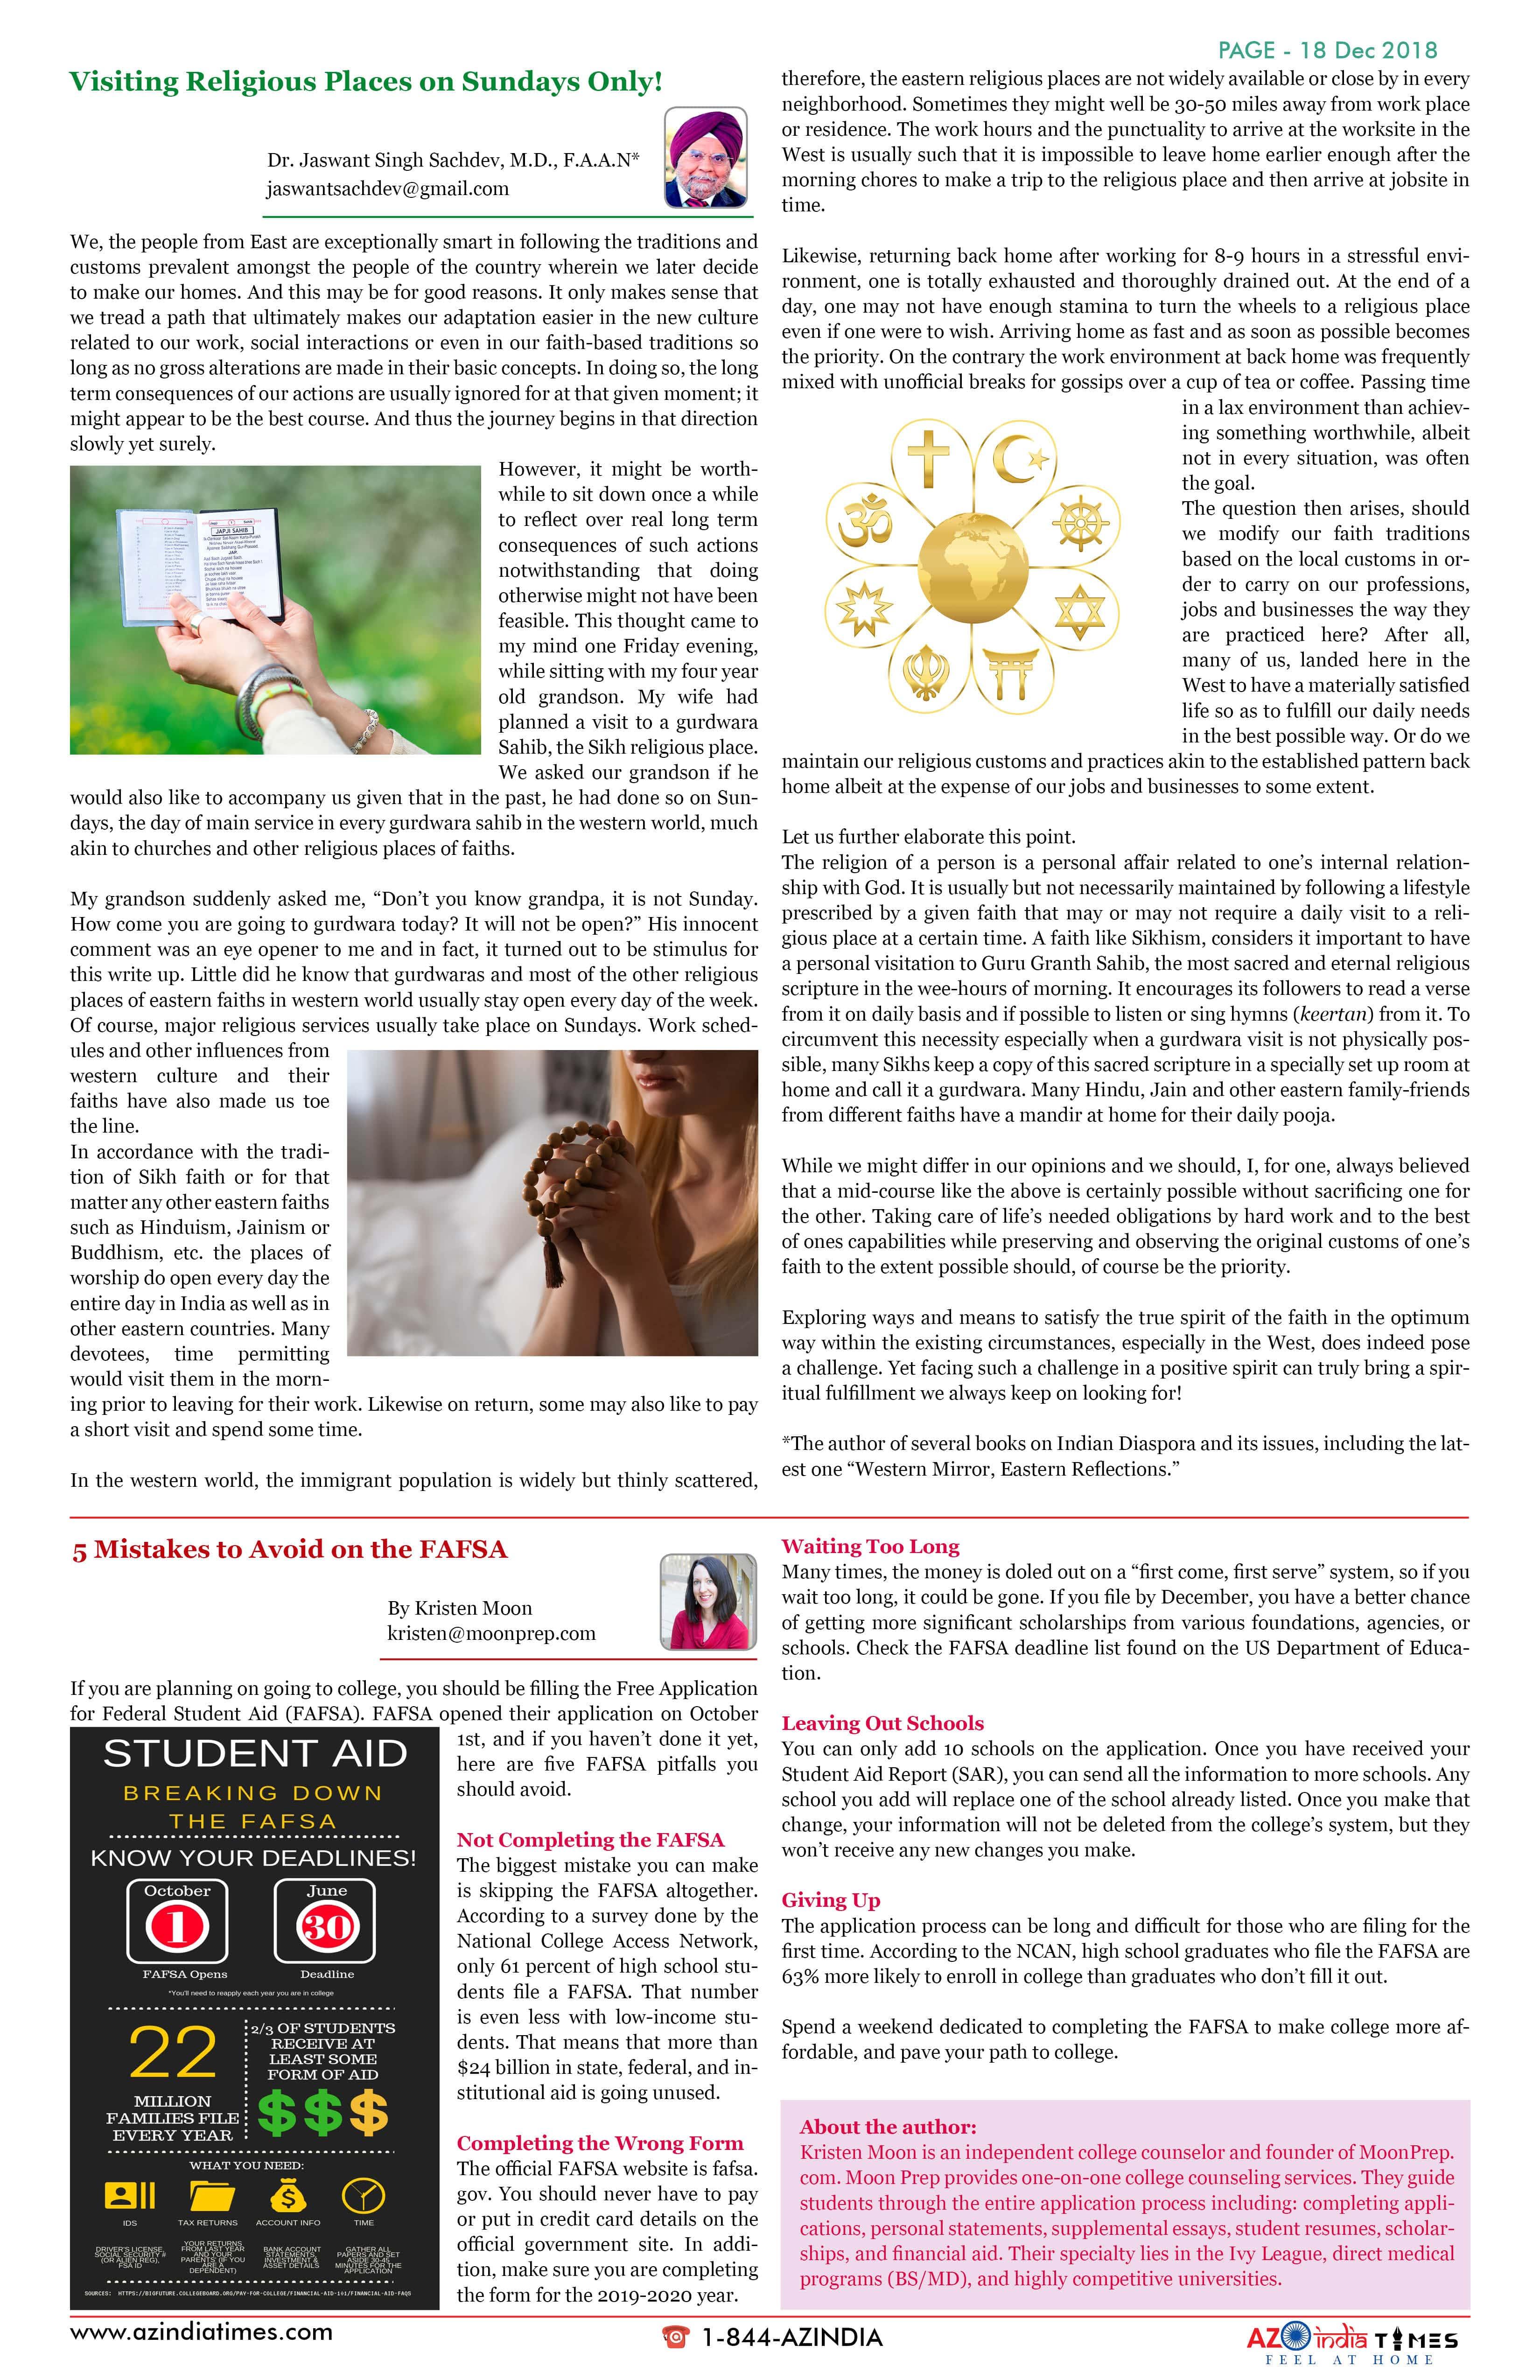 AZ INDIA DECEMBER EDITION 18